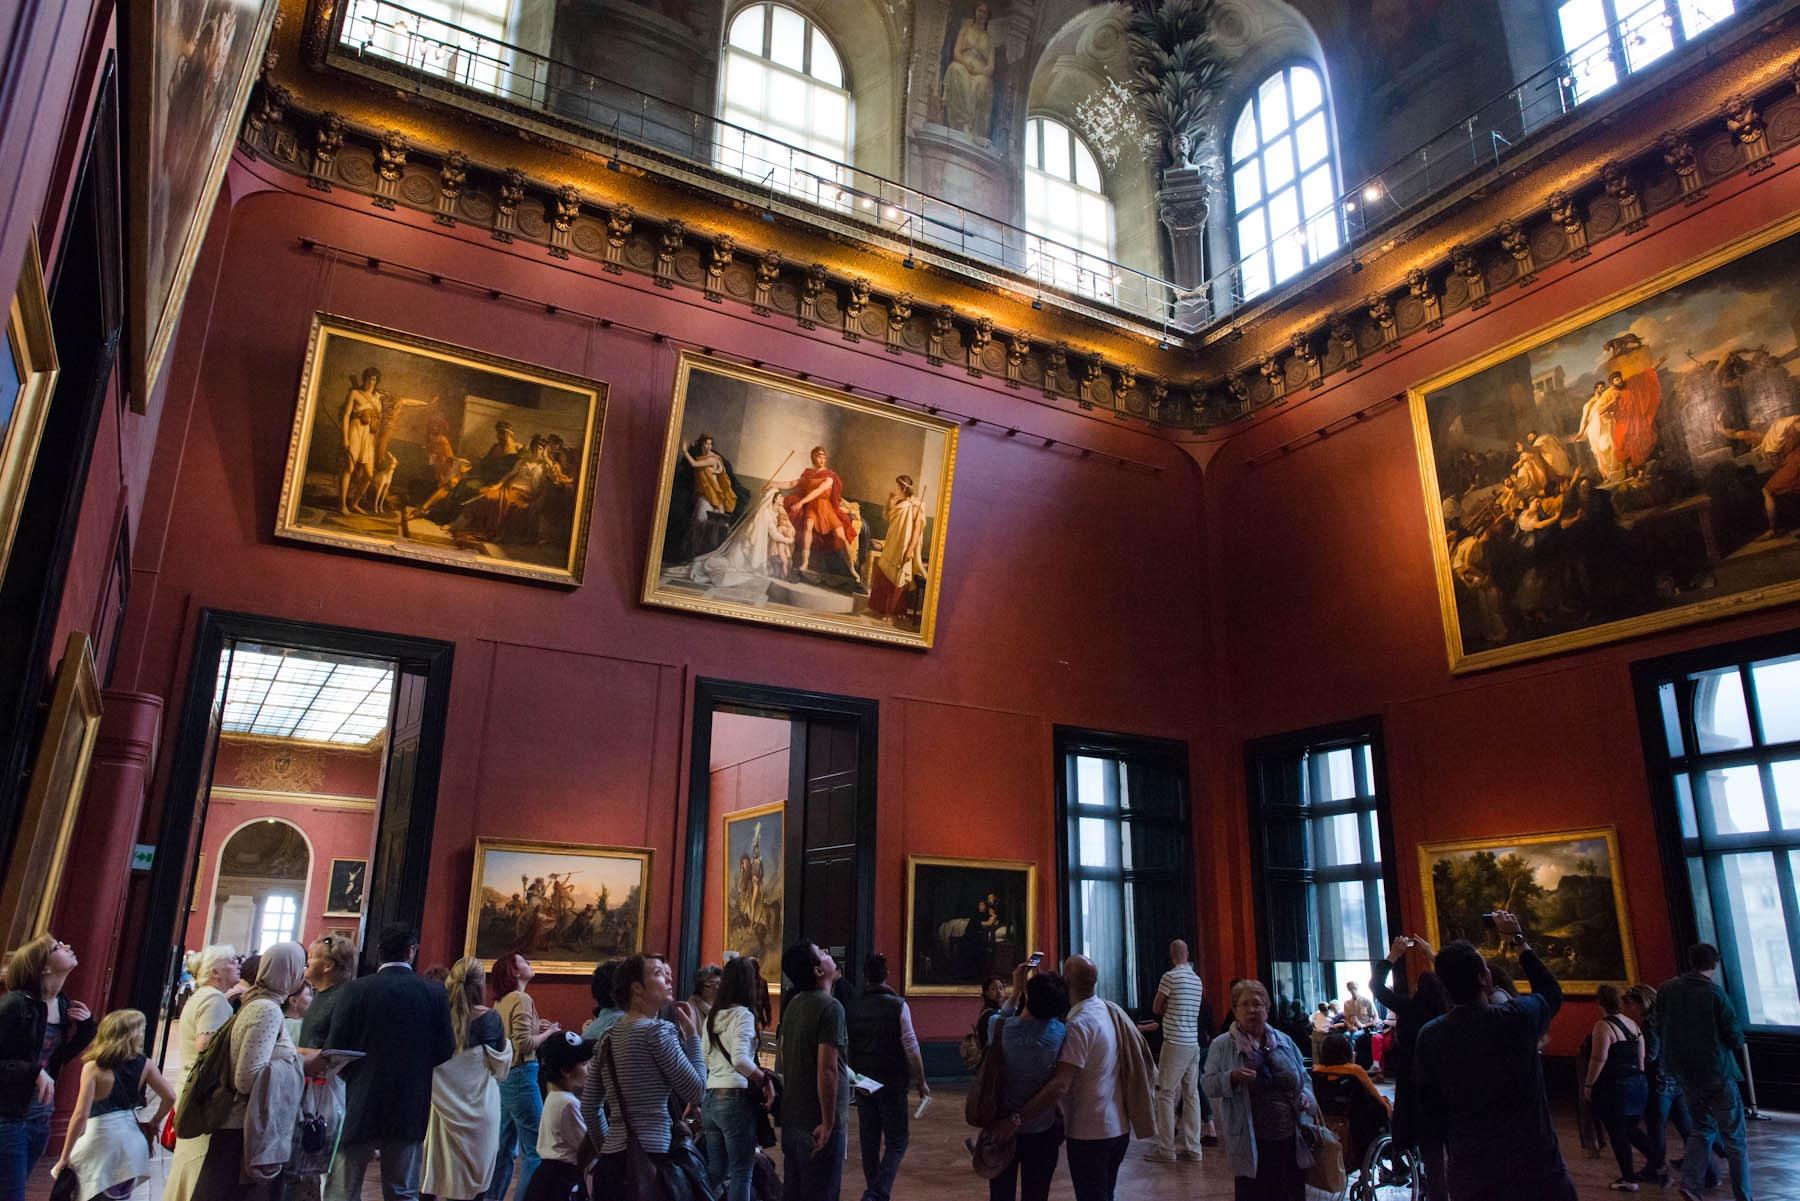 Dan le Louvre. A touch of Français, just like the reviews of Monsieur Photo Blogger...